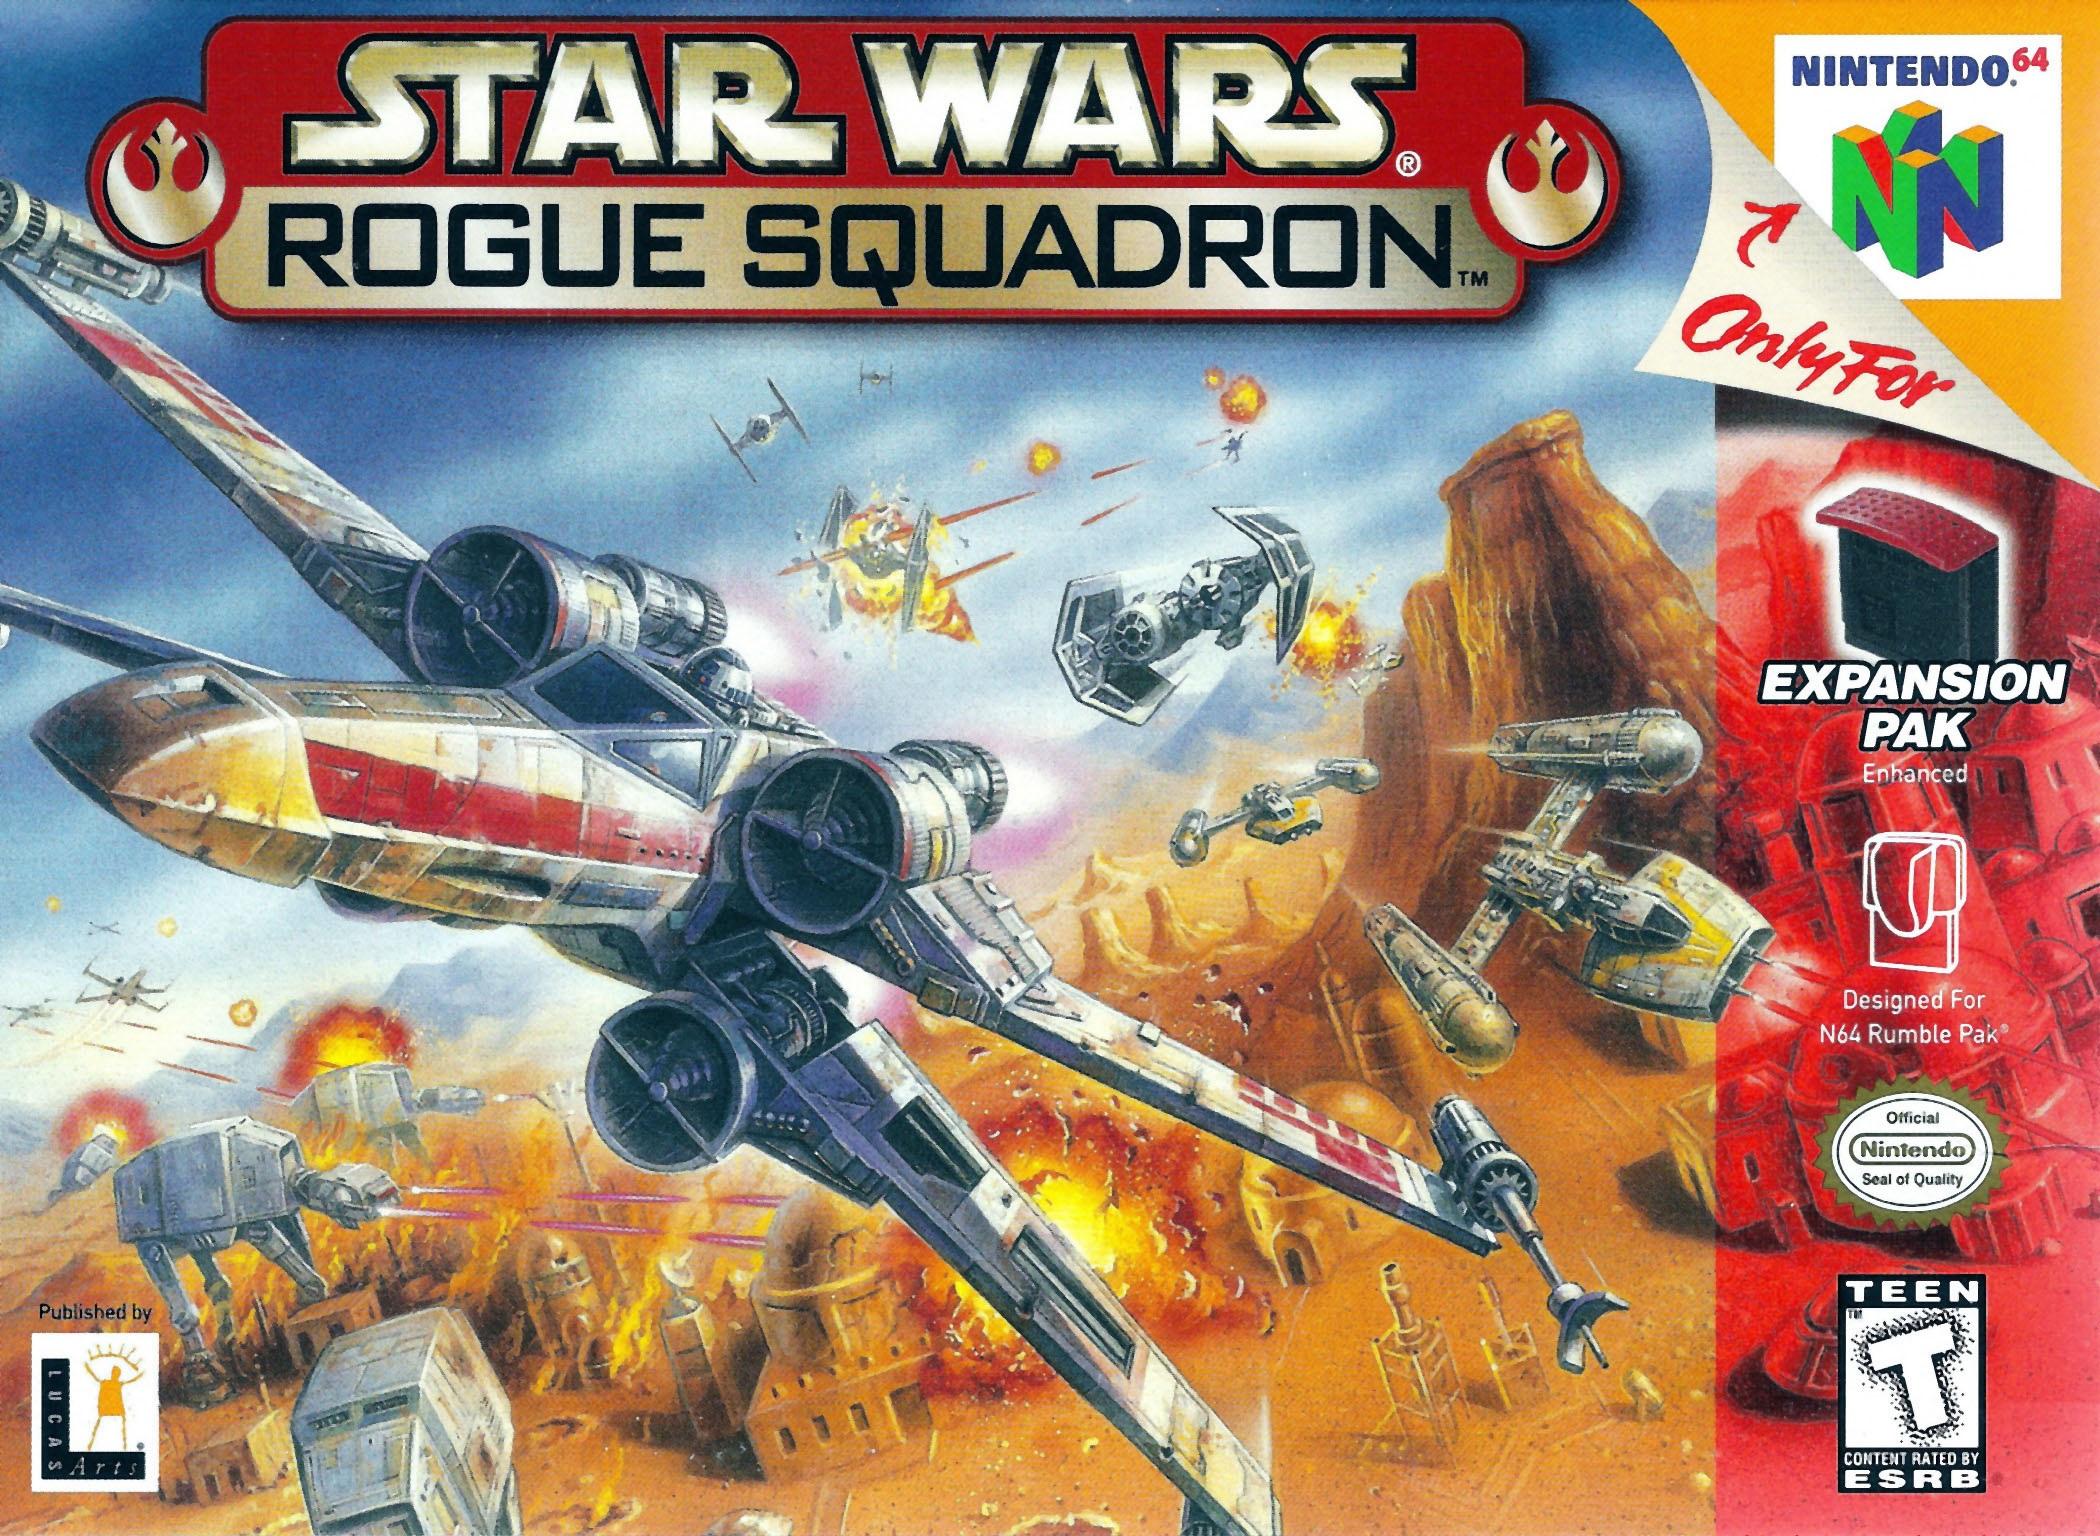 Star-Wars-Rogue-Squadron-N64